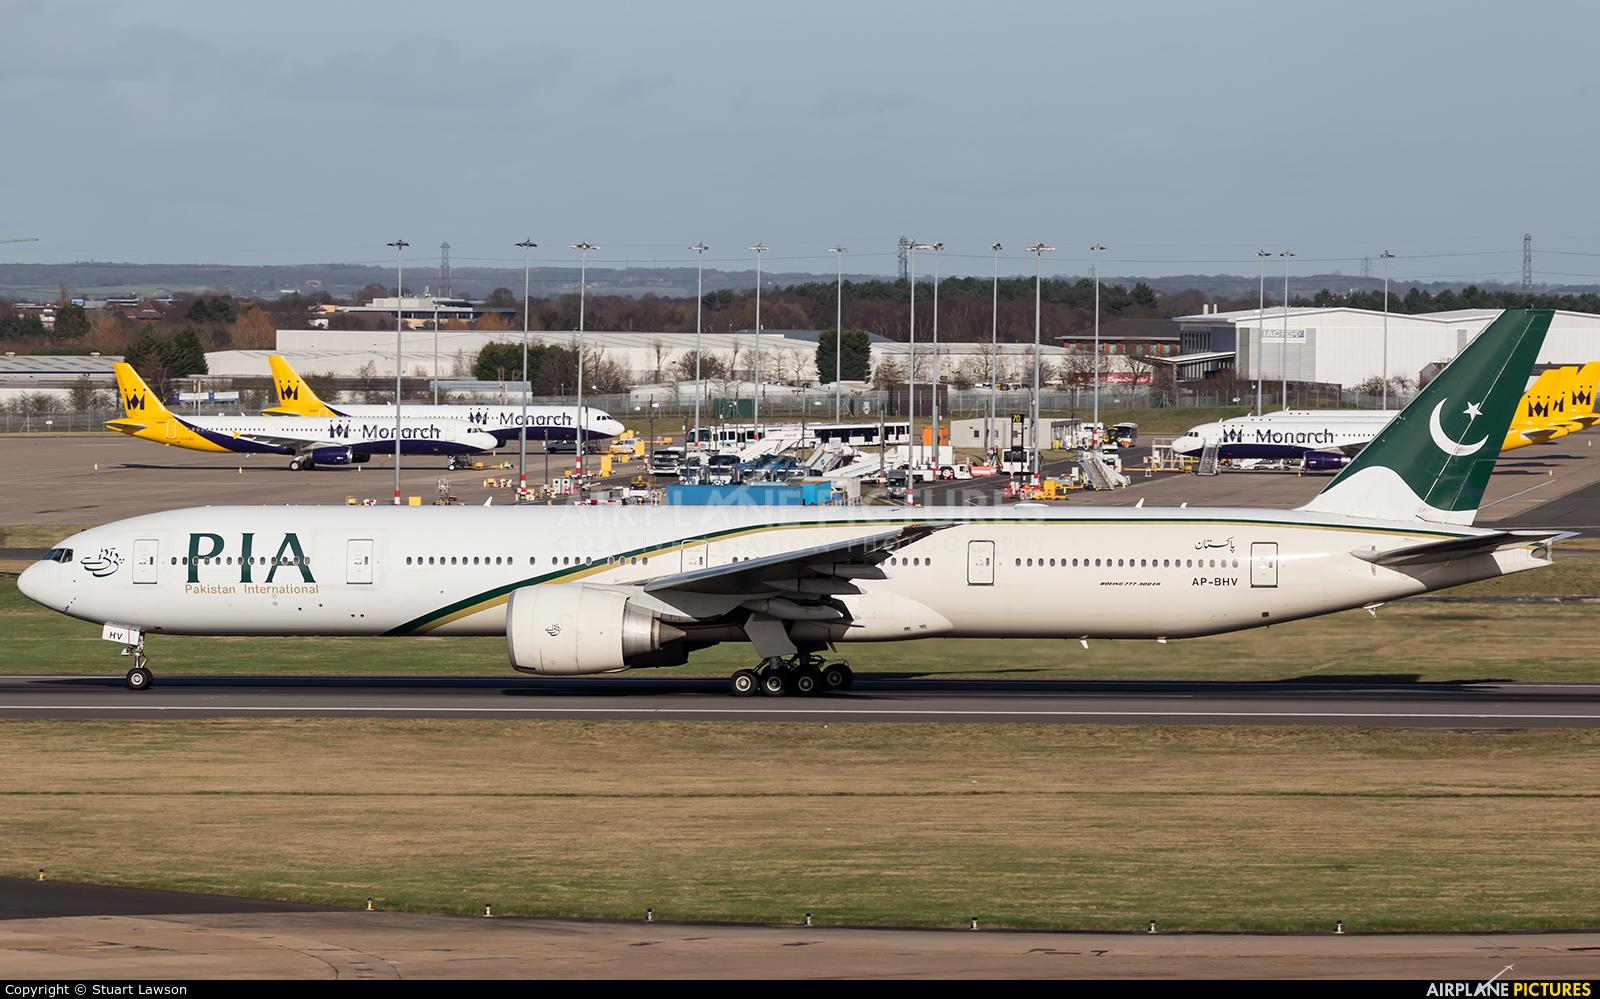 PIA - Pakistan International Airlines AP-BHV aircraft at Birmingham